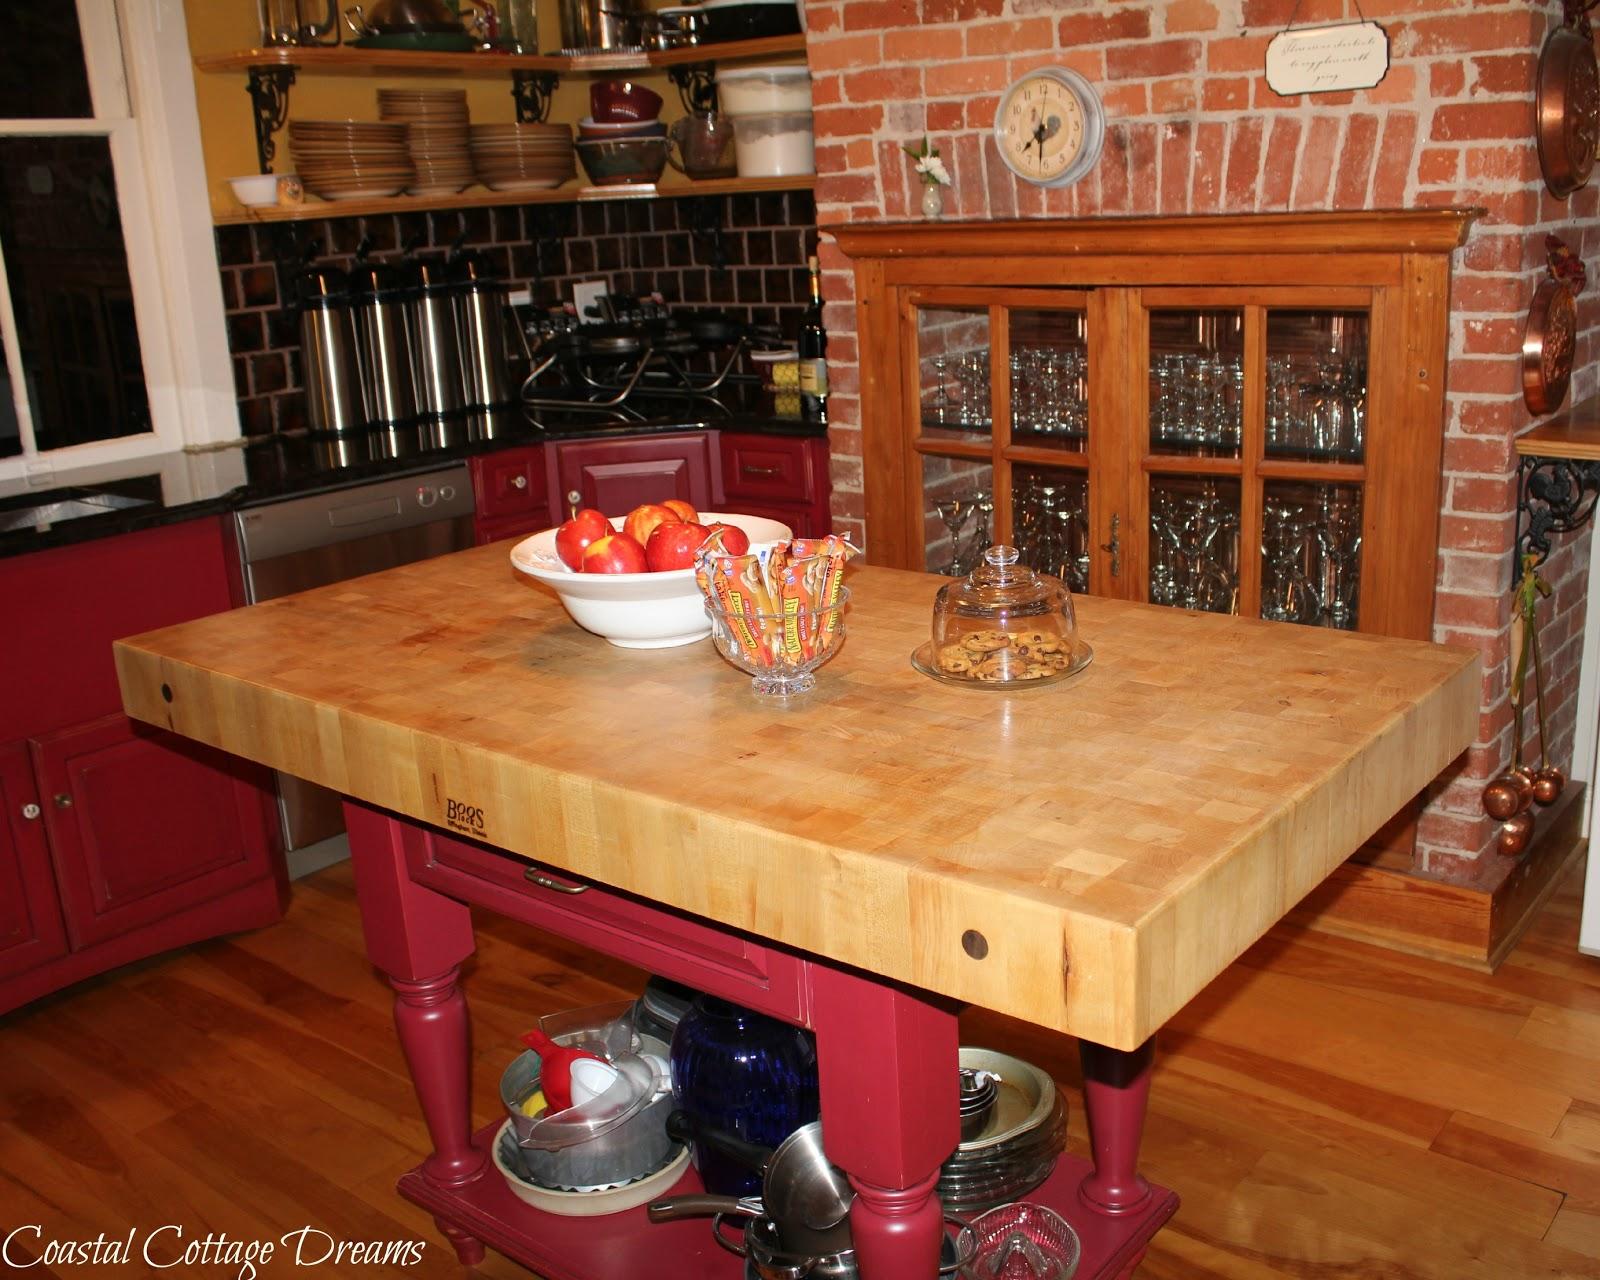 Charmant John Boos Table, Oh How I Miss My John Boos Table